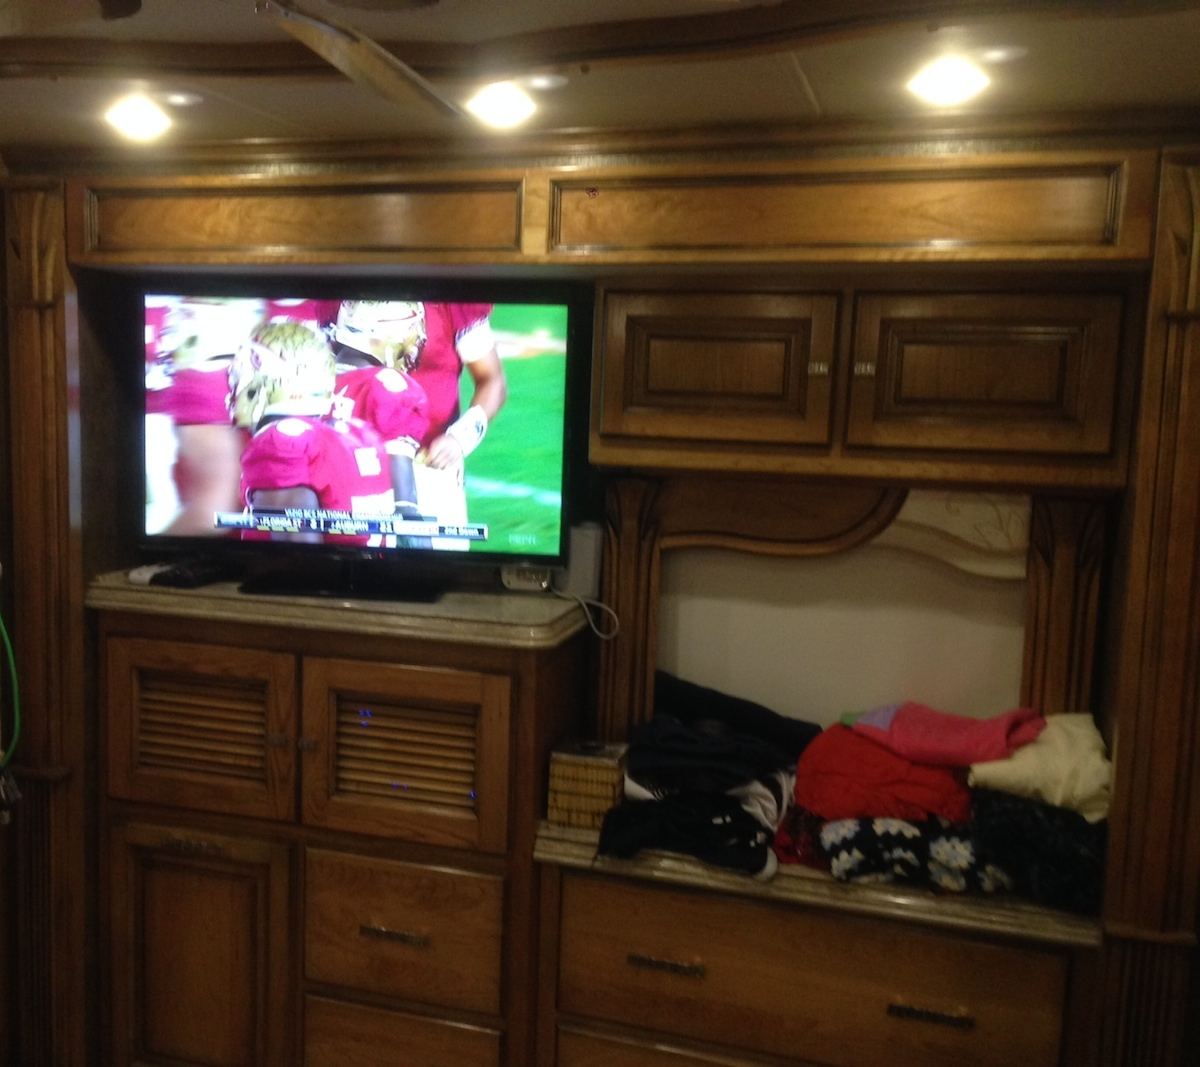 Click image for larger version  Name:Bedroom 42 inch TV Overhead Cabinets dresser Media Center and Hamper cabinetry.jpg Views:111 Size:333.0 KB ID:53493